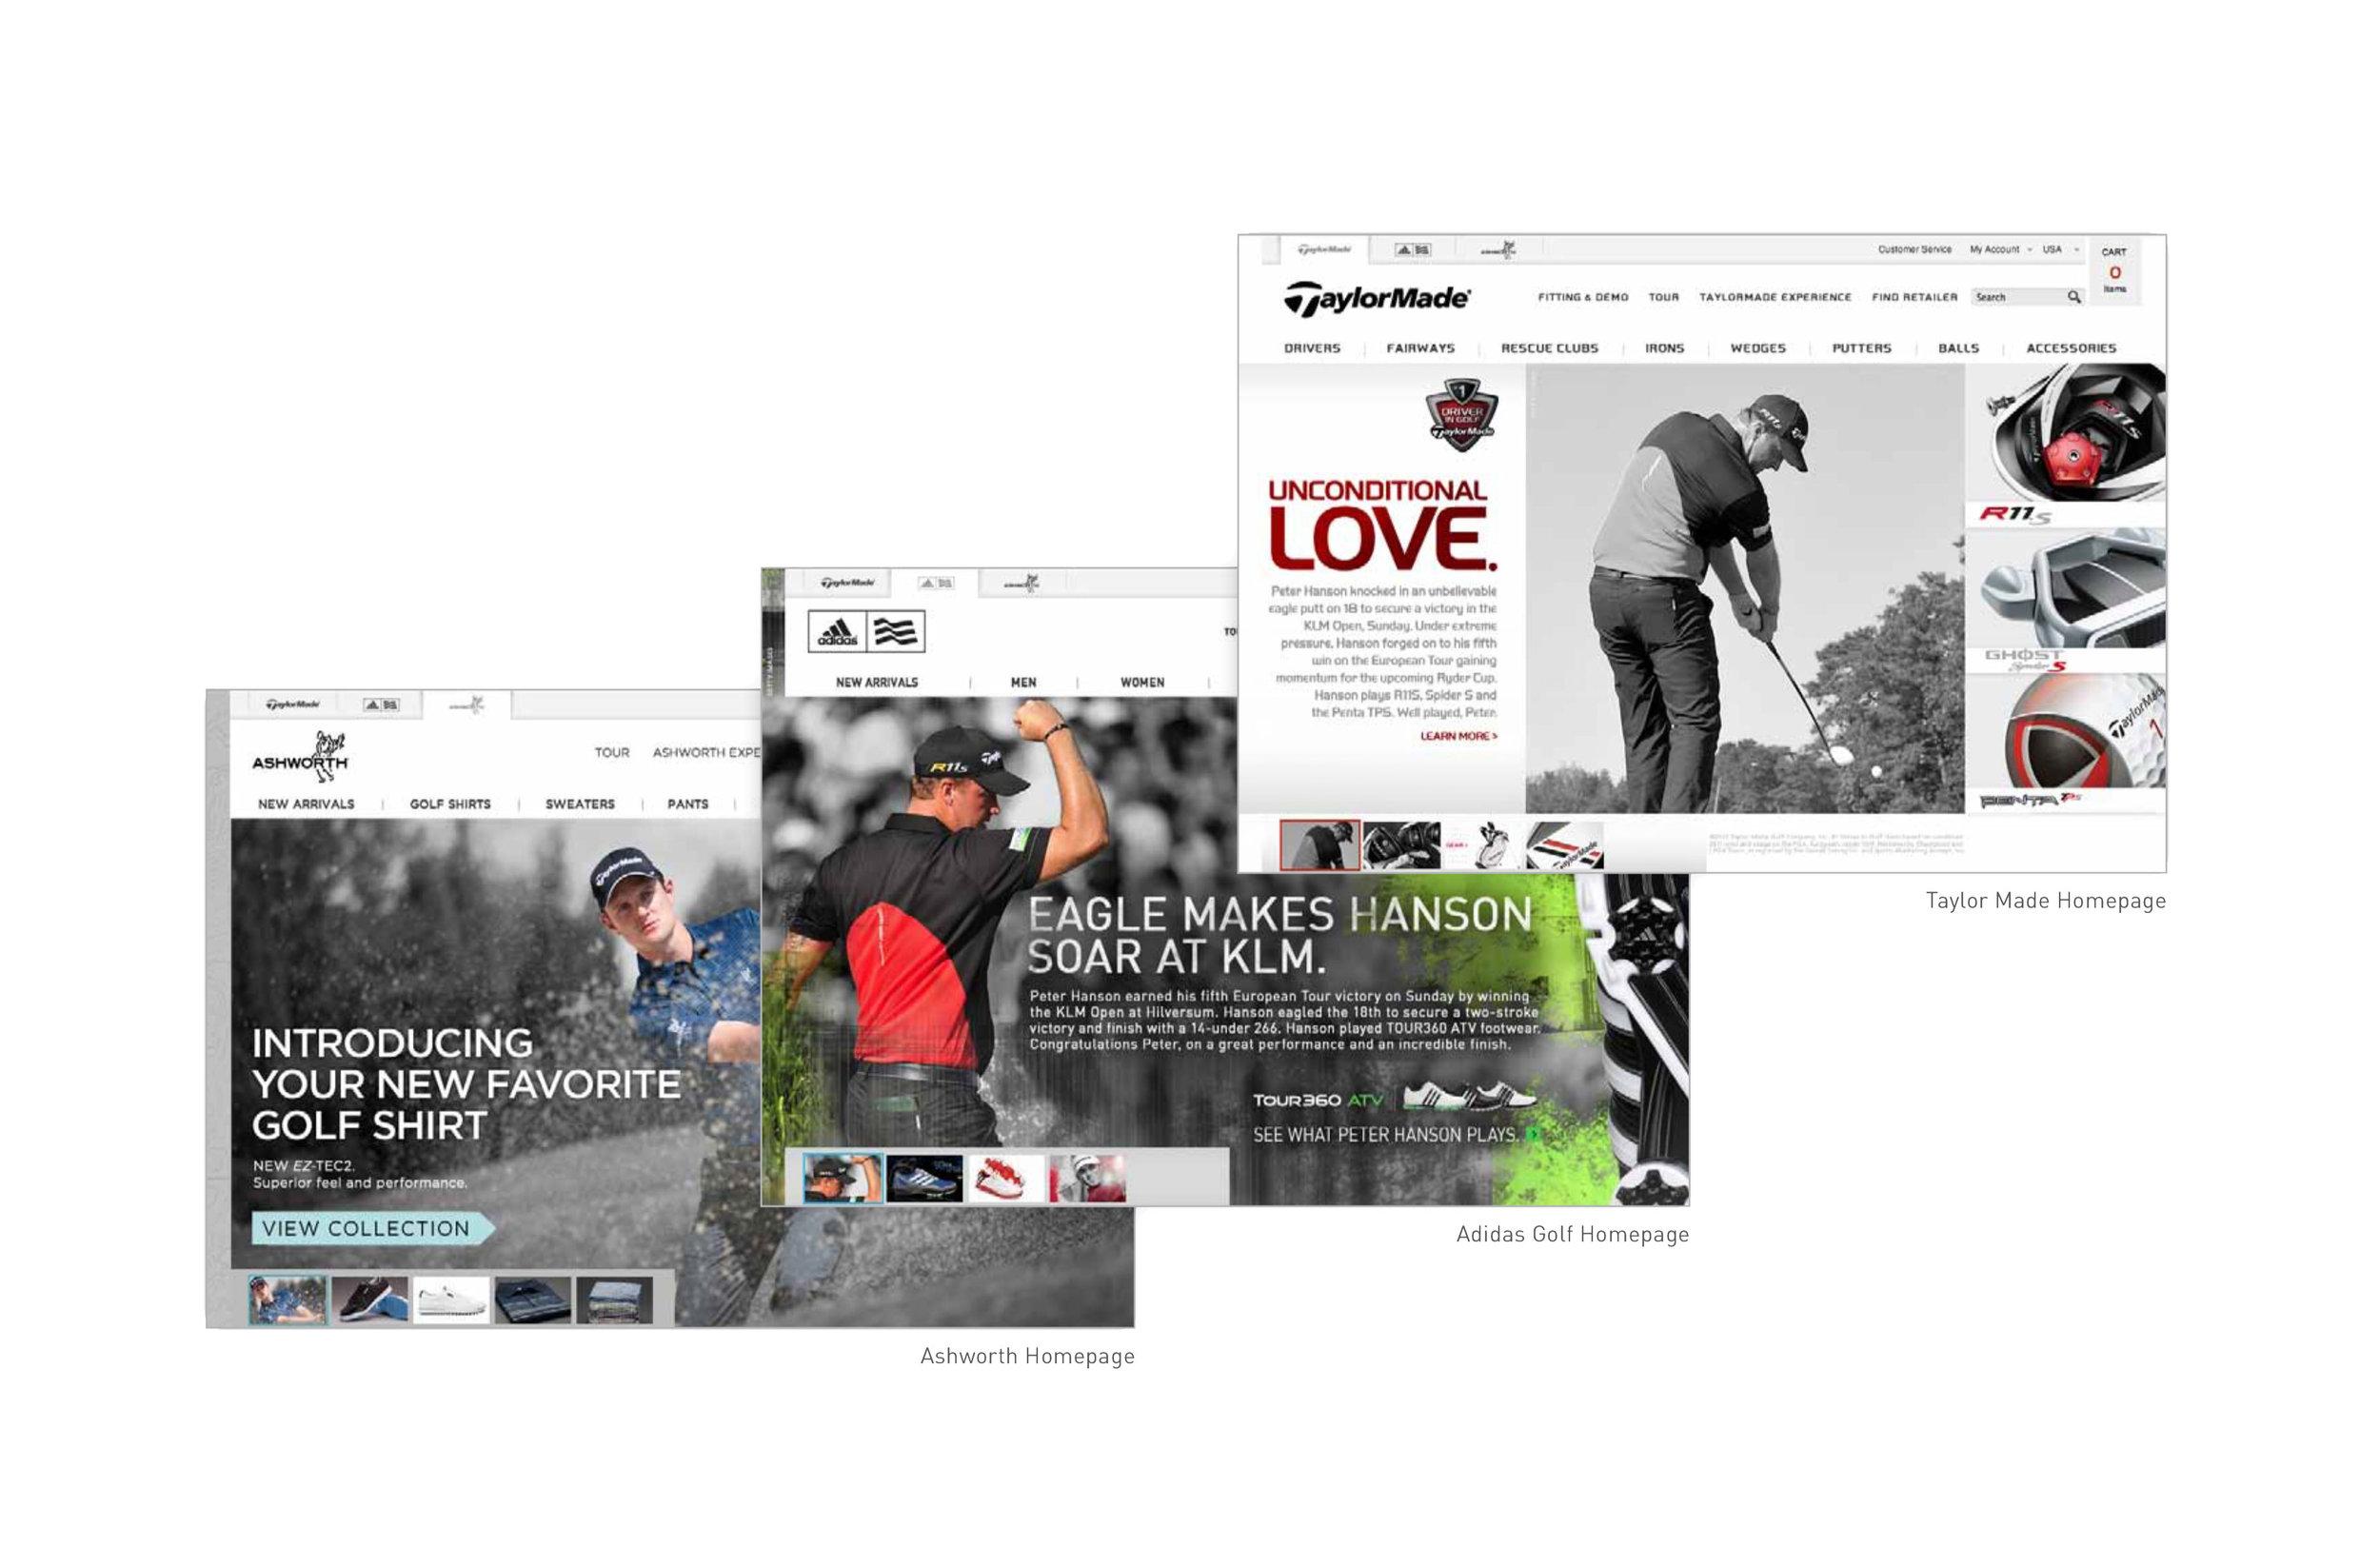 TaylorMade, adidas Golf and Ashworth Golf - UI/UX • DESIGN